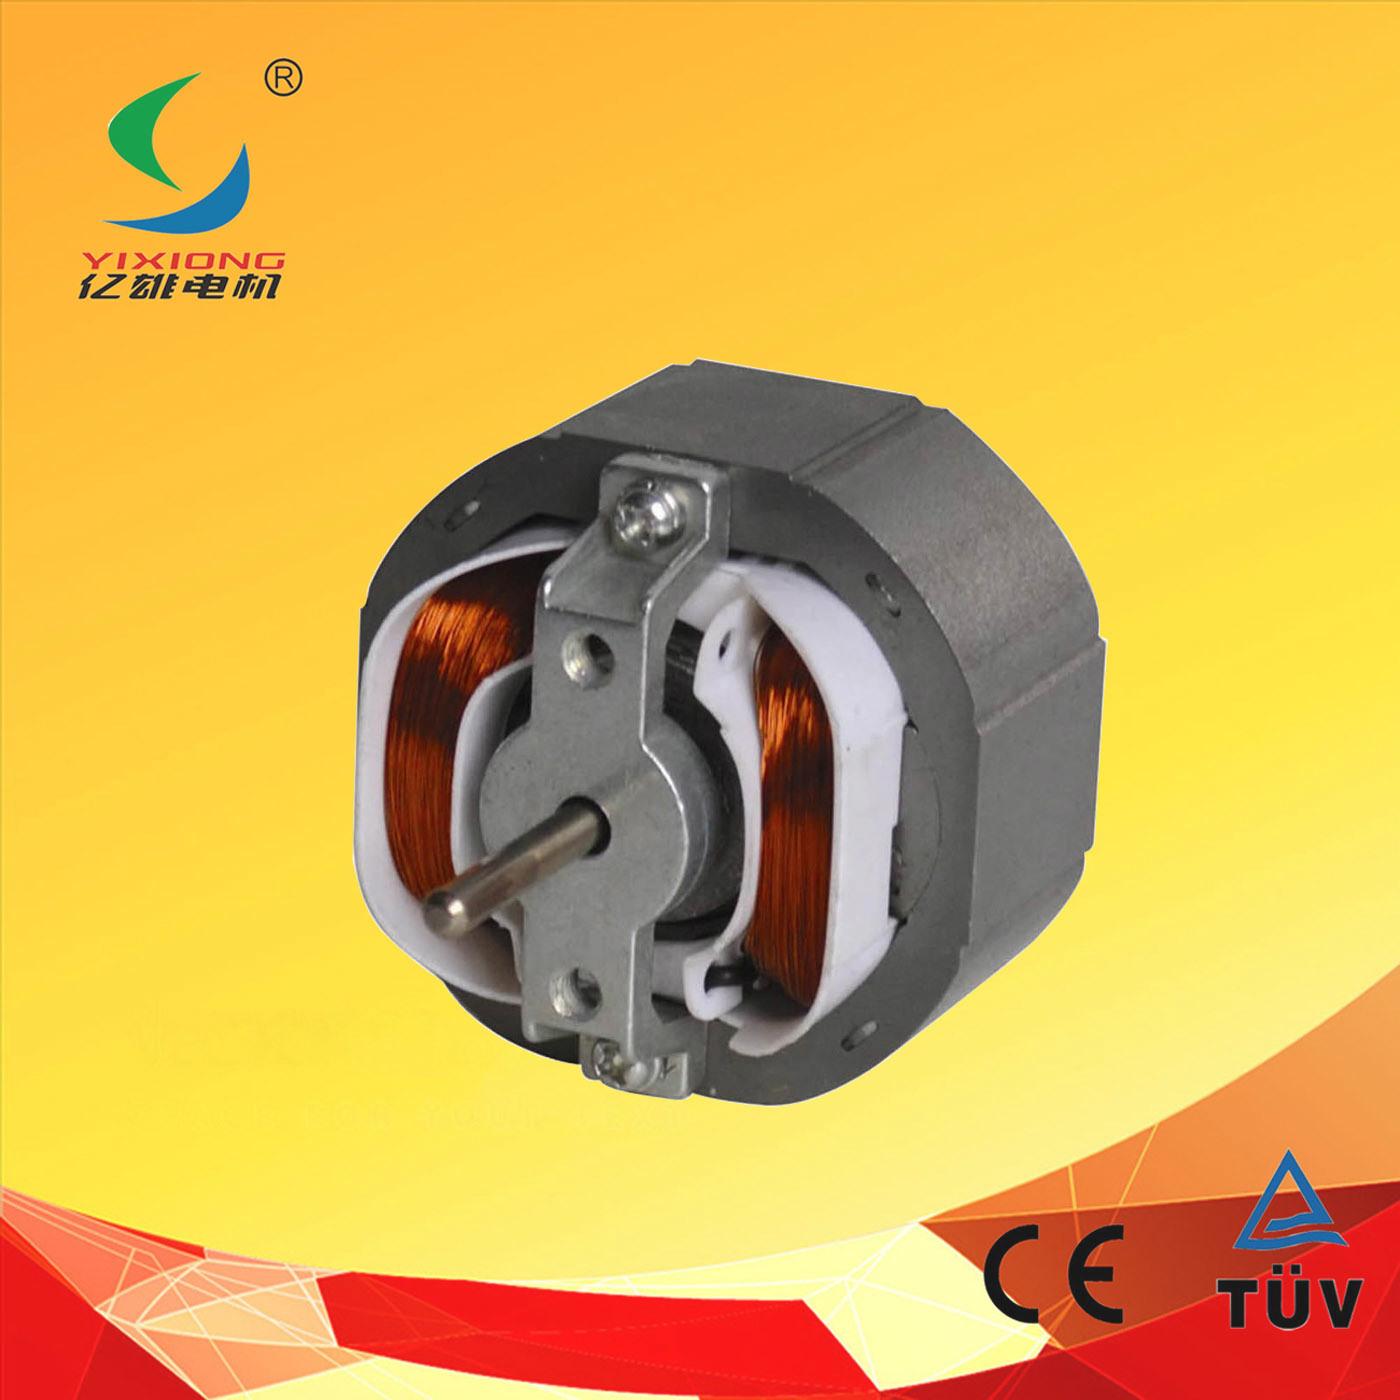 Powerful Bathroom Extractor Fan >> Hot Item Yj5812 Powerful Bathroom Extractor Fan Motor